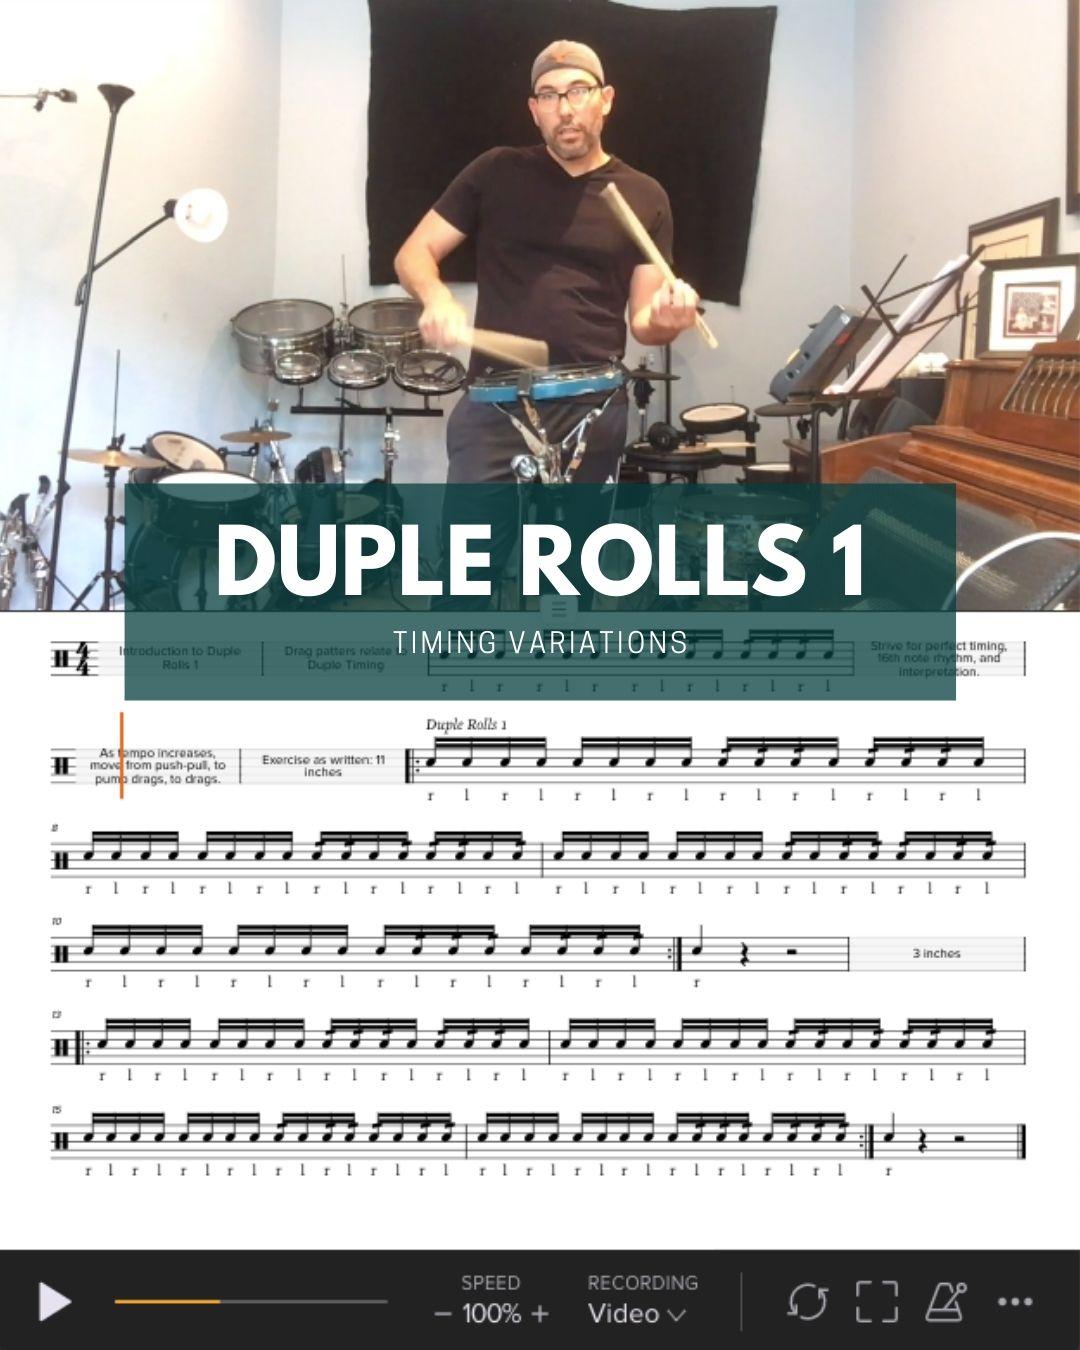 Duple Rolls 1